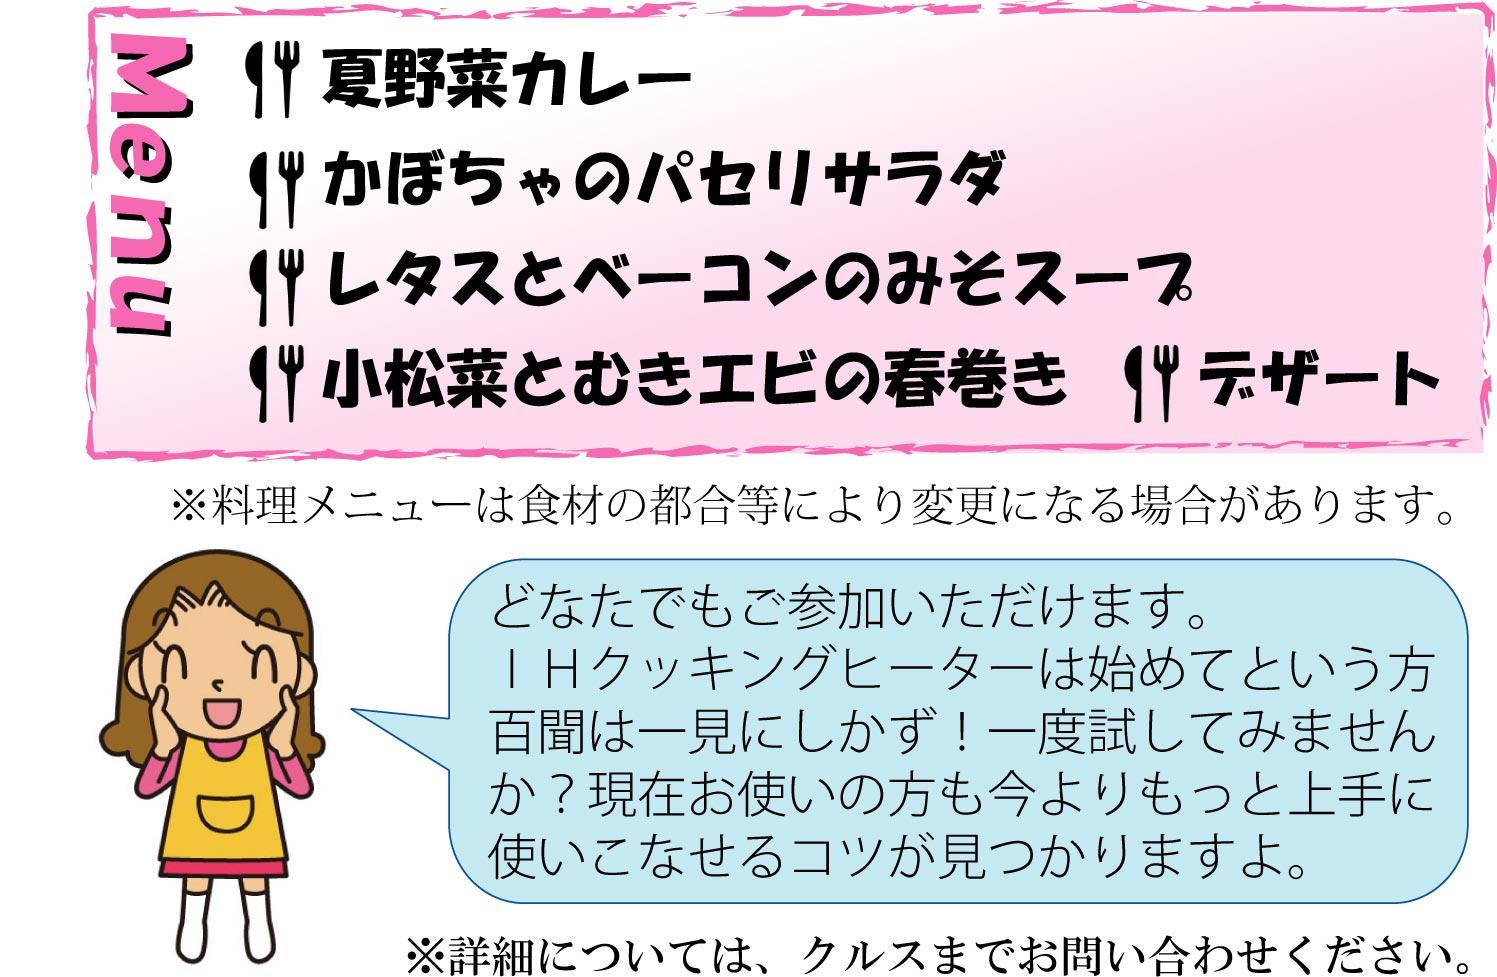 KuraSi-natu-sin74-14.jpg